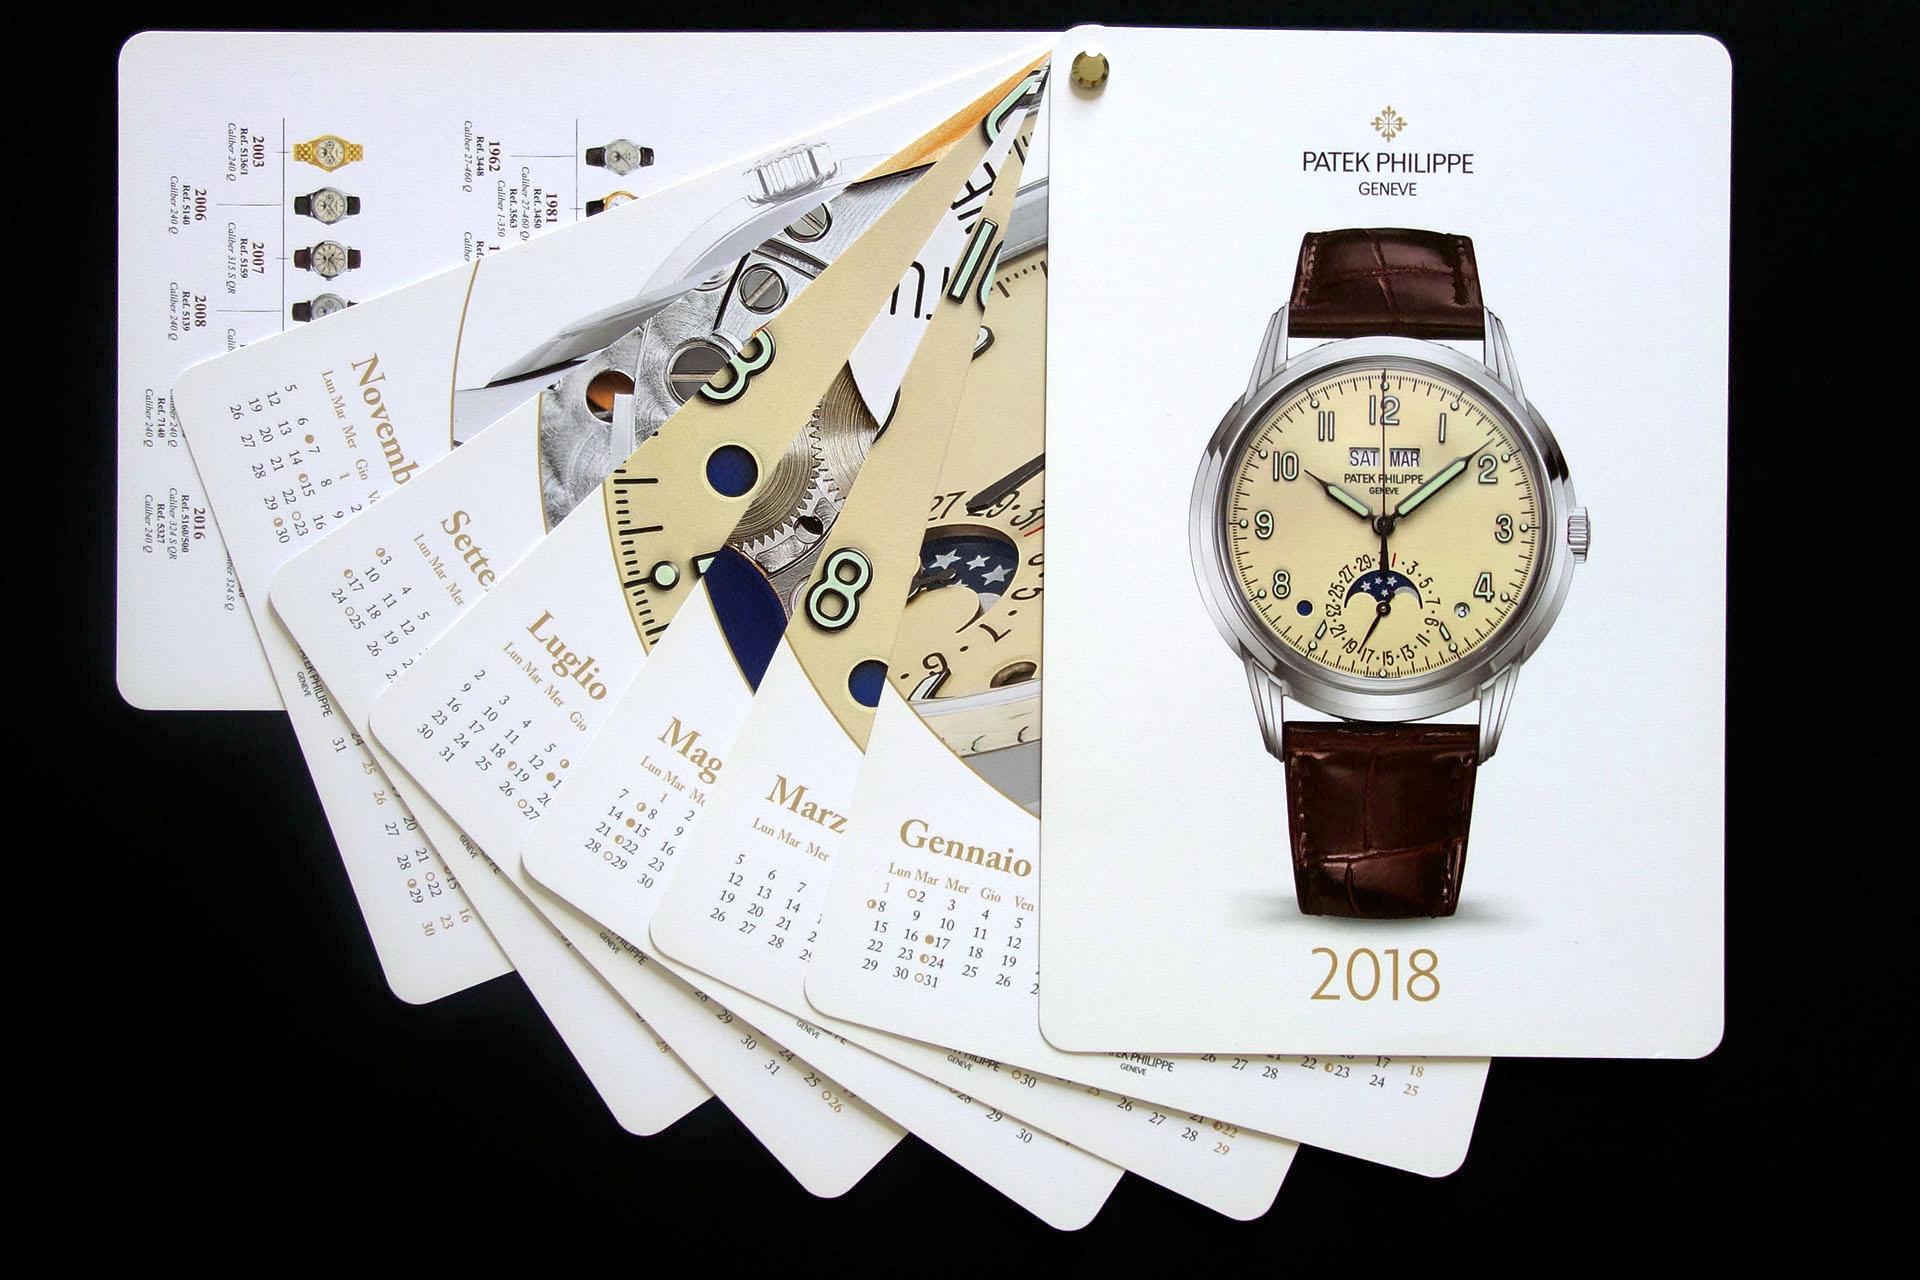 Calendario Domino Swan Group Patek Philippe